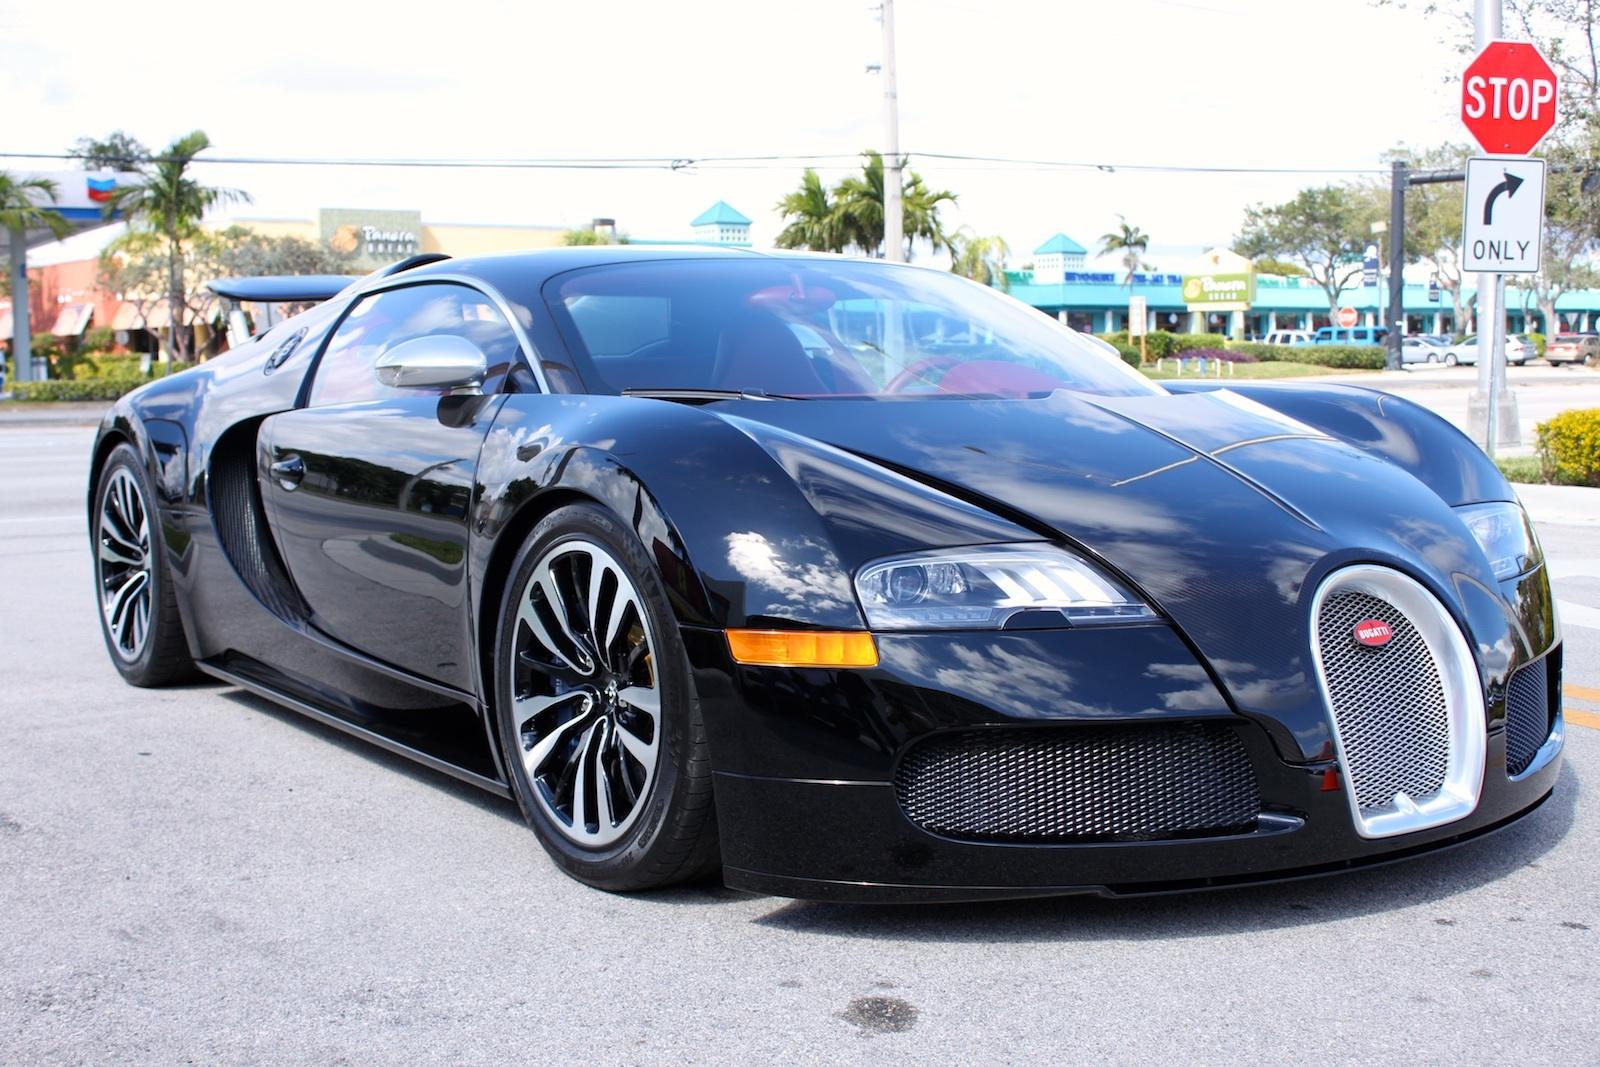 2010 Bugatti Veyron Eb 16 4 Sang Noir Exotic Car List